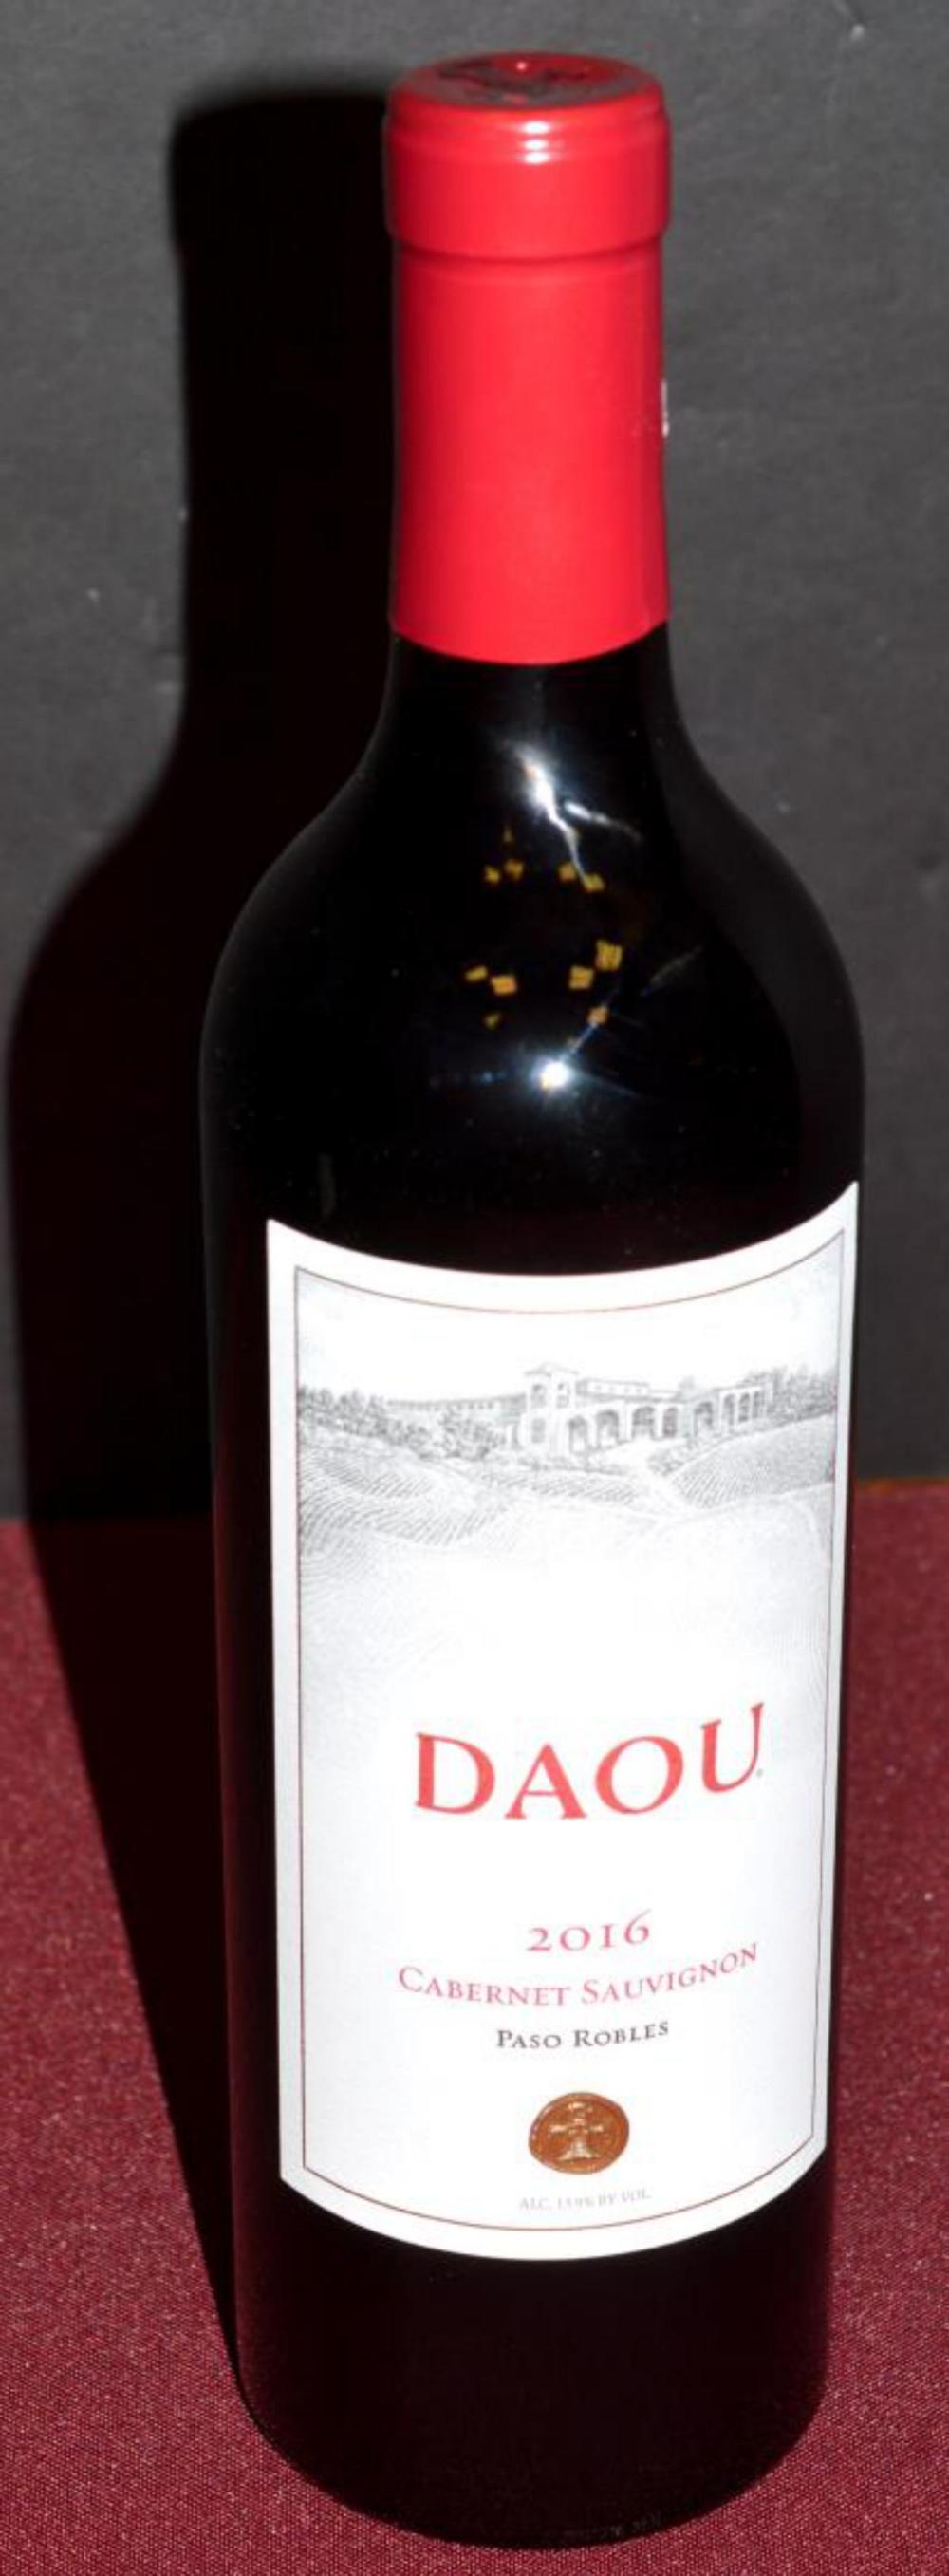 Daou 16' Cabernet Sauvignon Wine Robles Collection